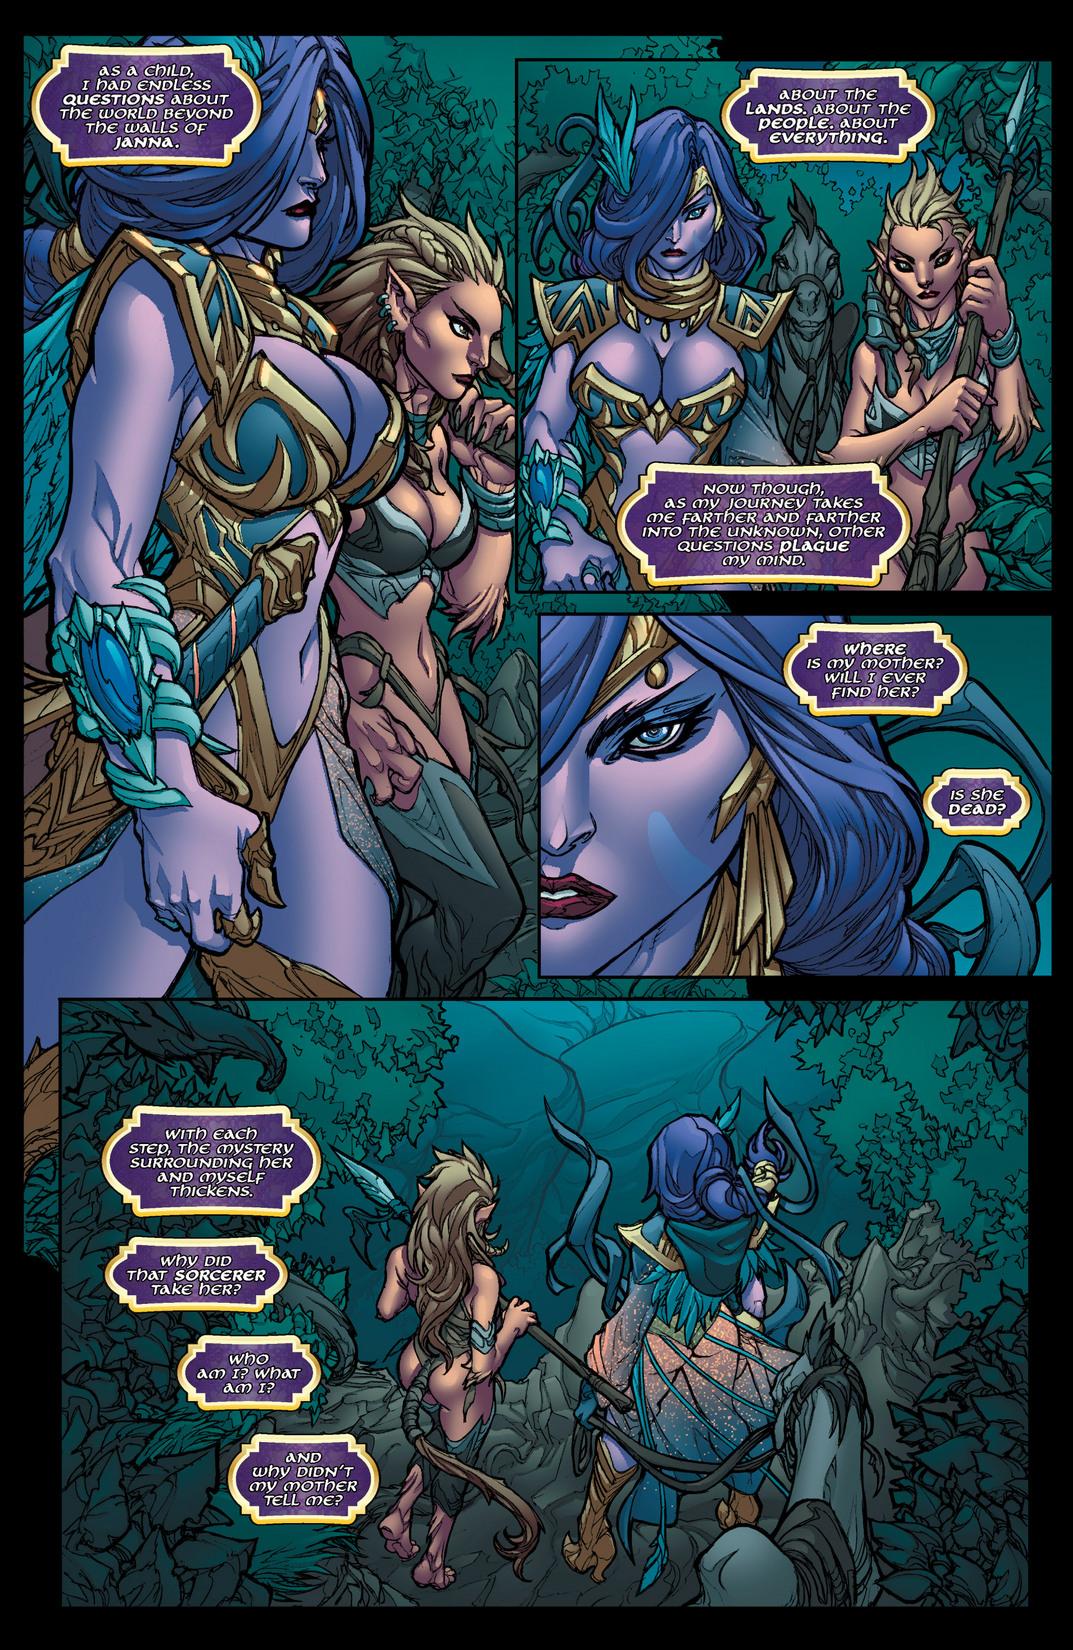 Read online Jirni comic -  Issue #1 - 21